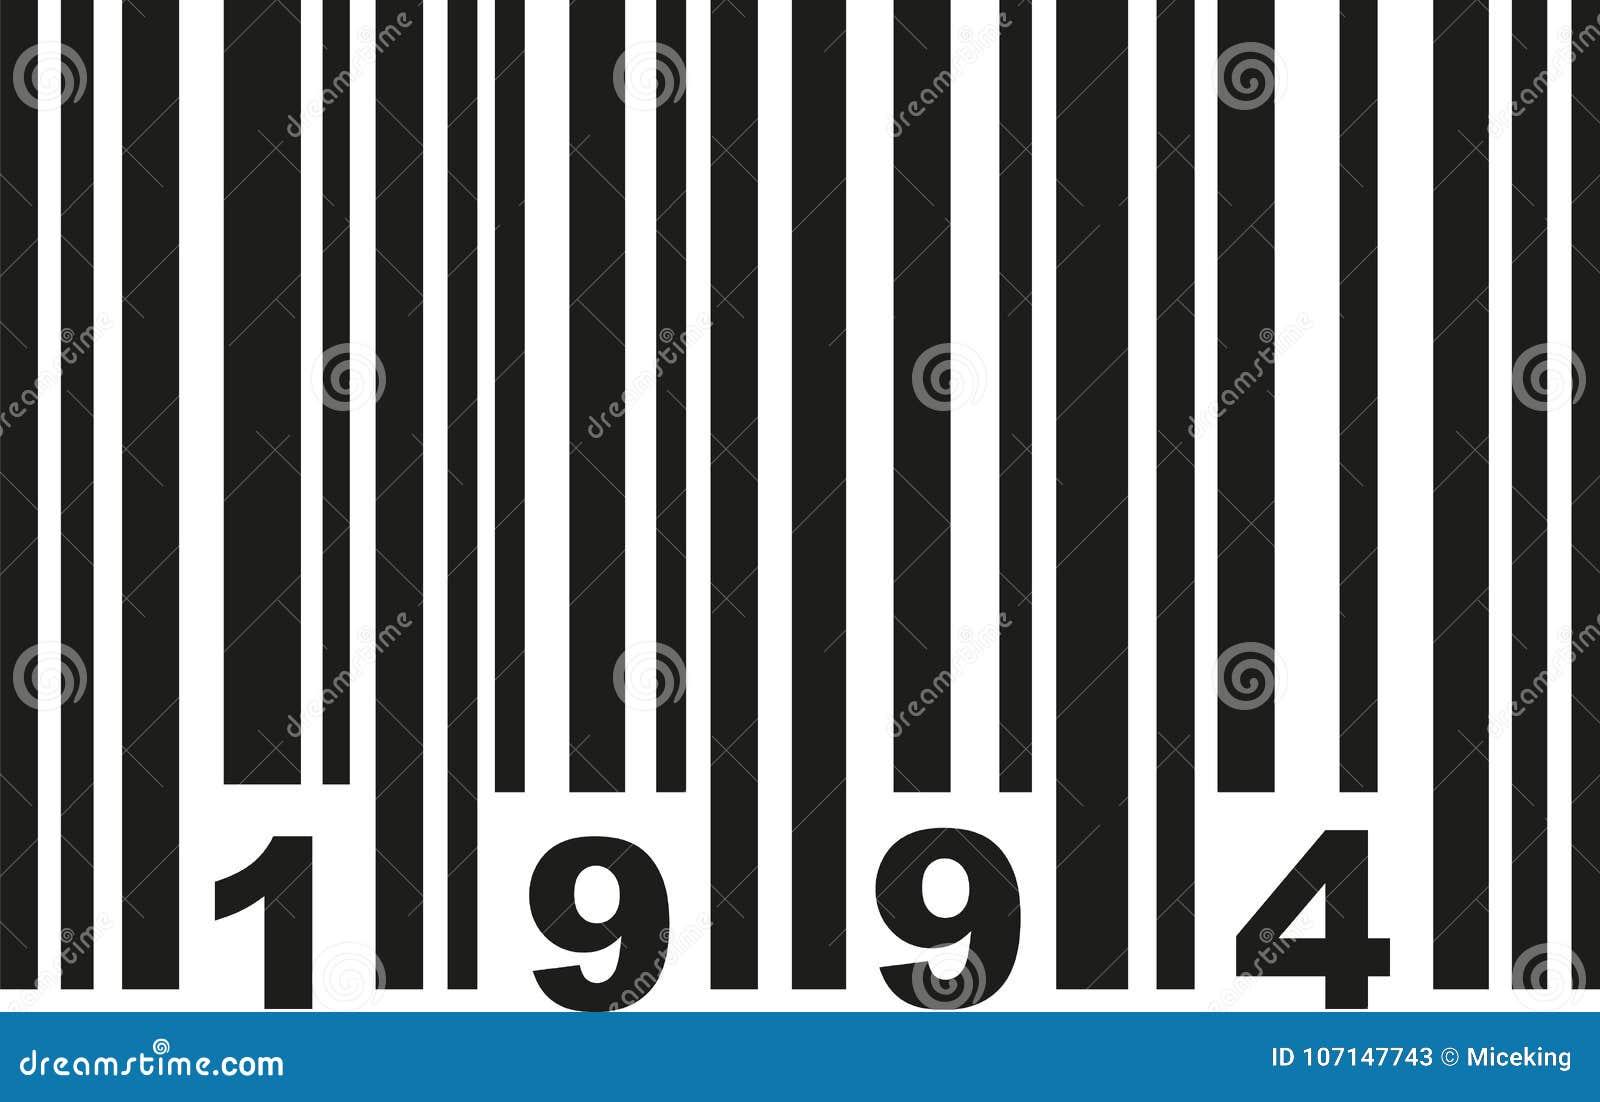 Barcode 1994 vector